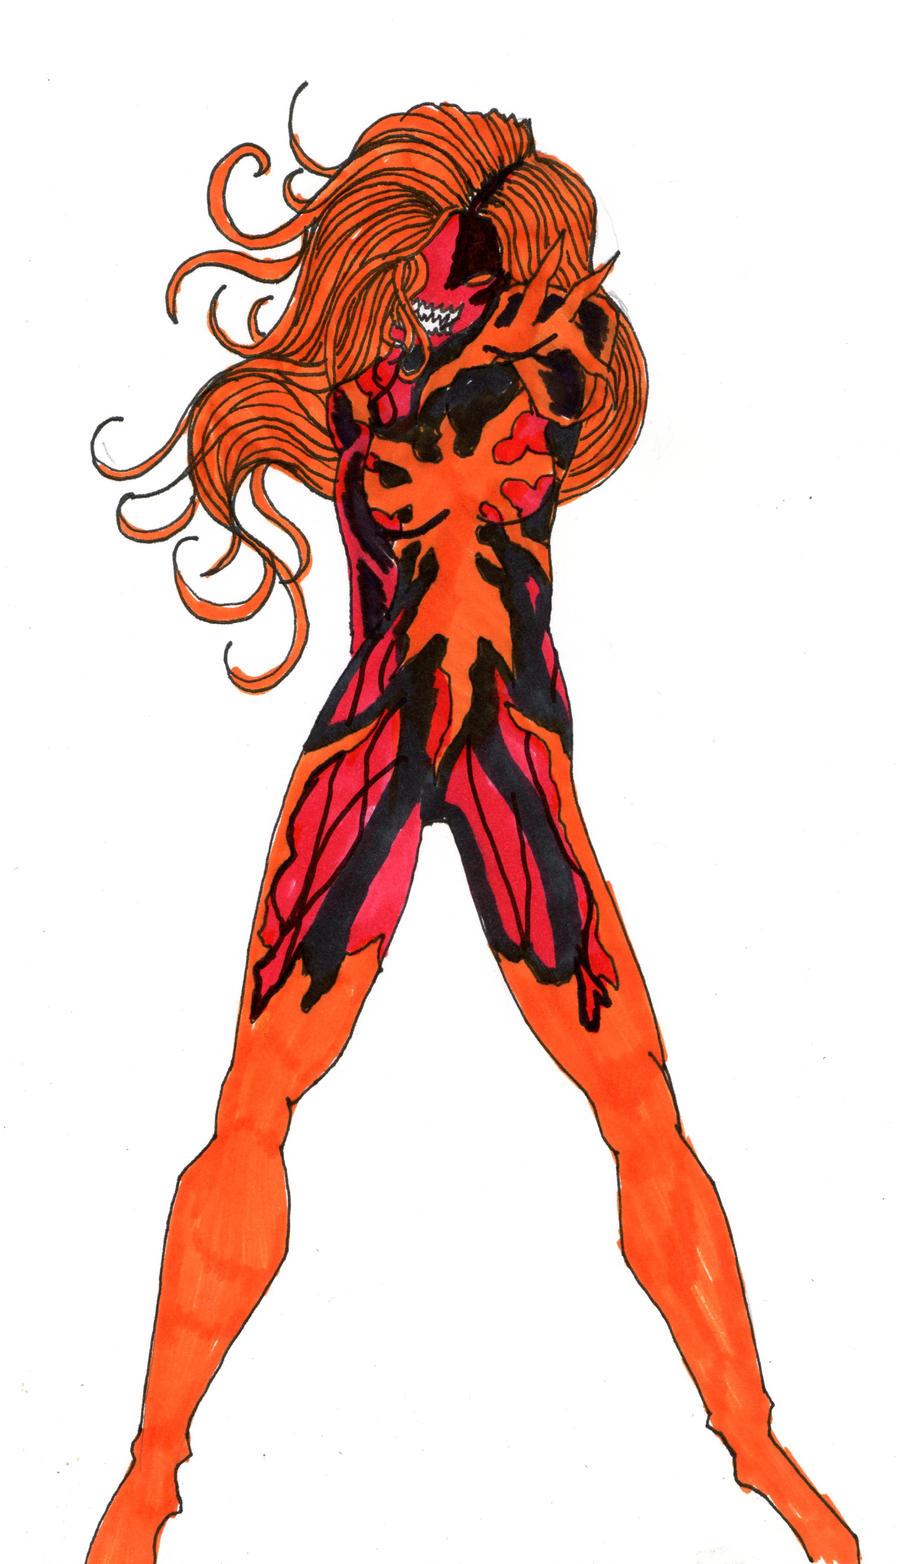 symbiote_dark_phoenix_by_hulkling-d3dzpy2.jpg